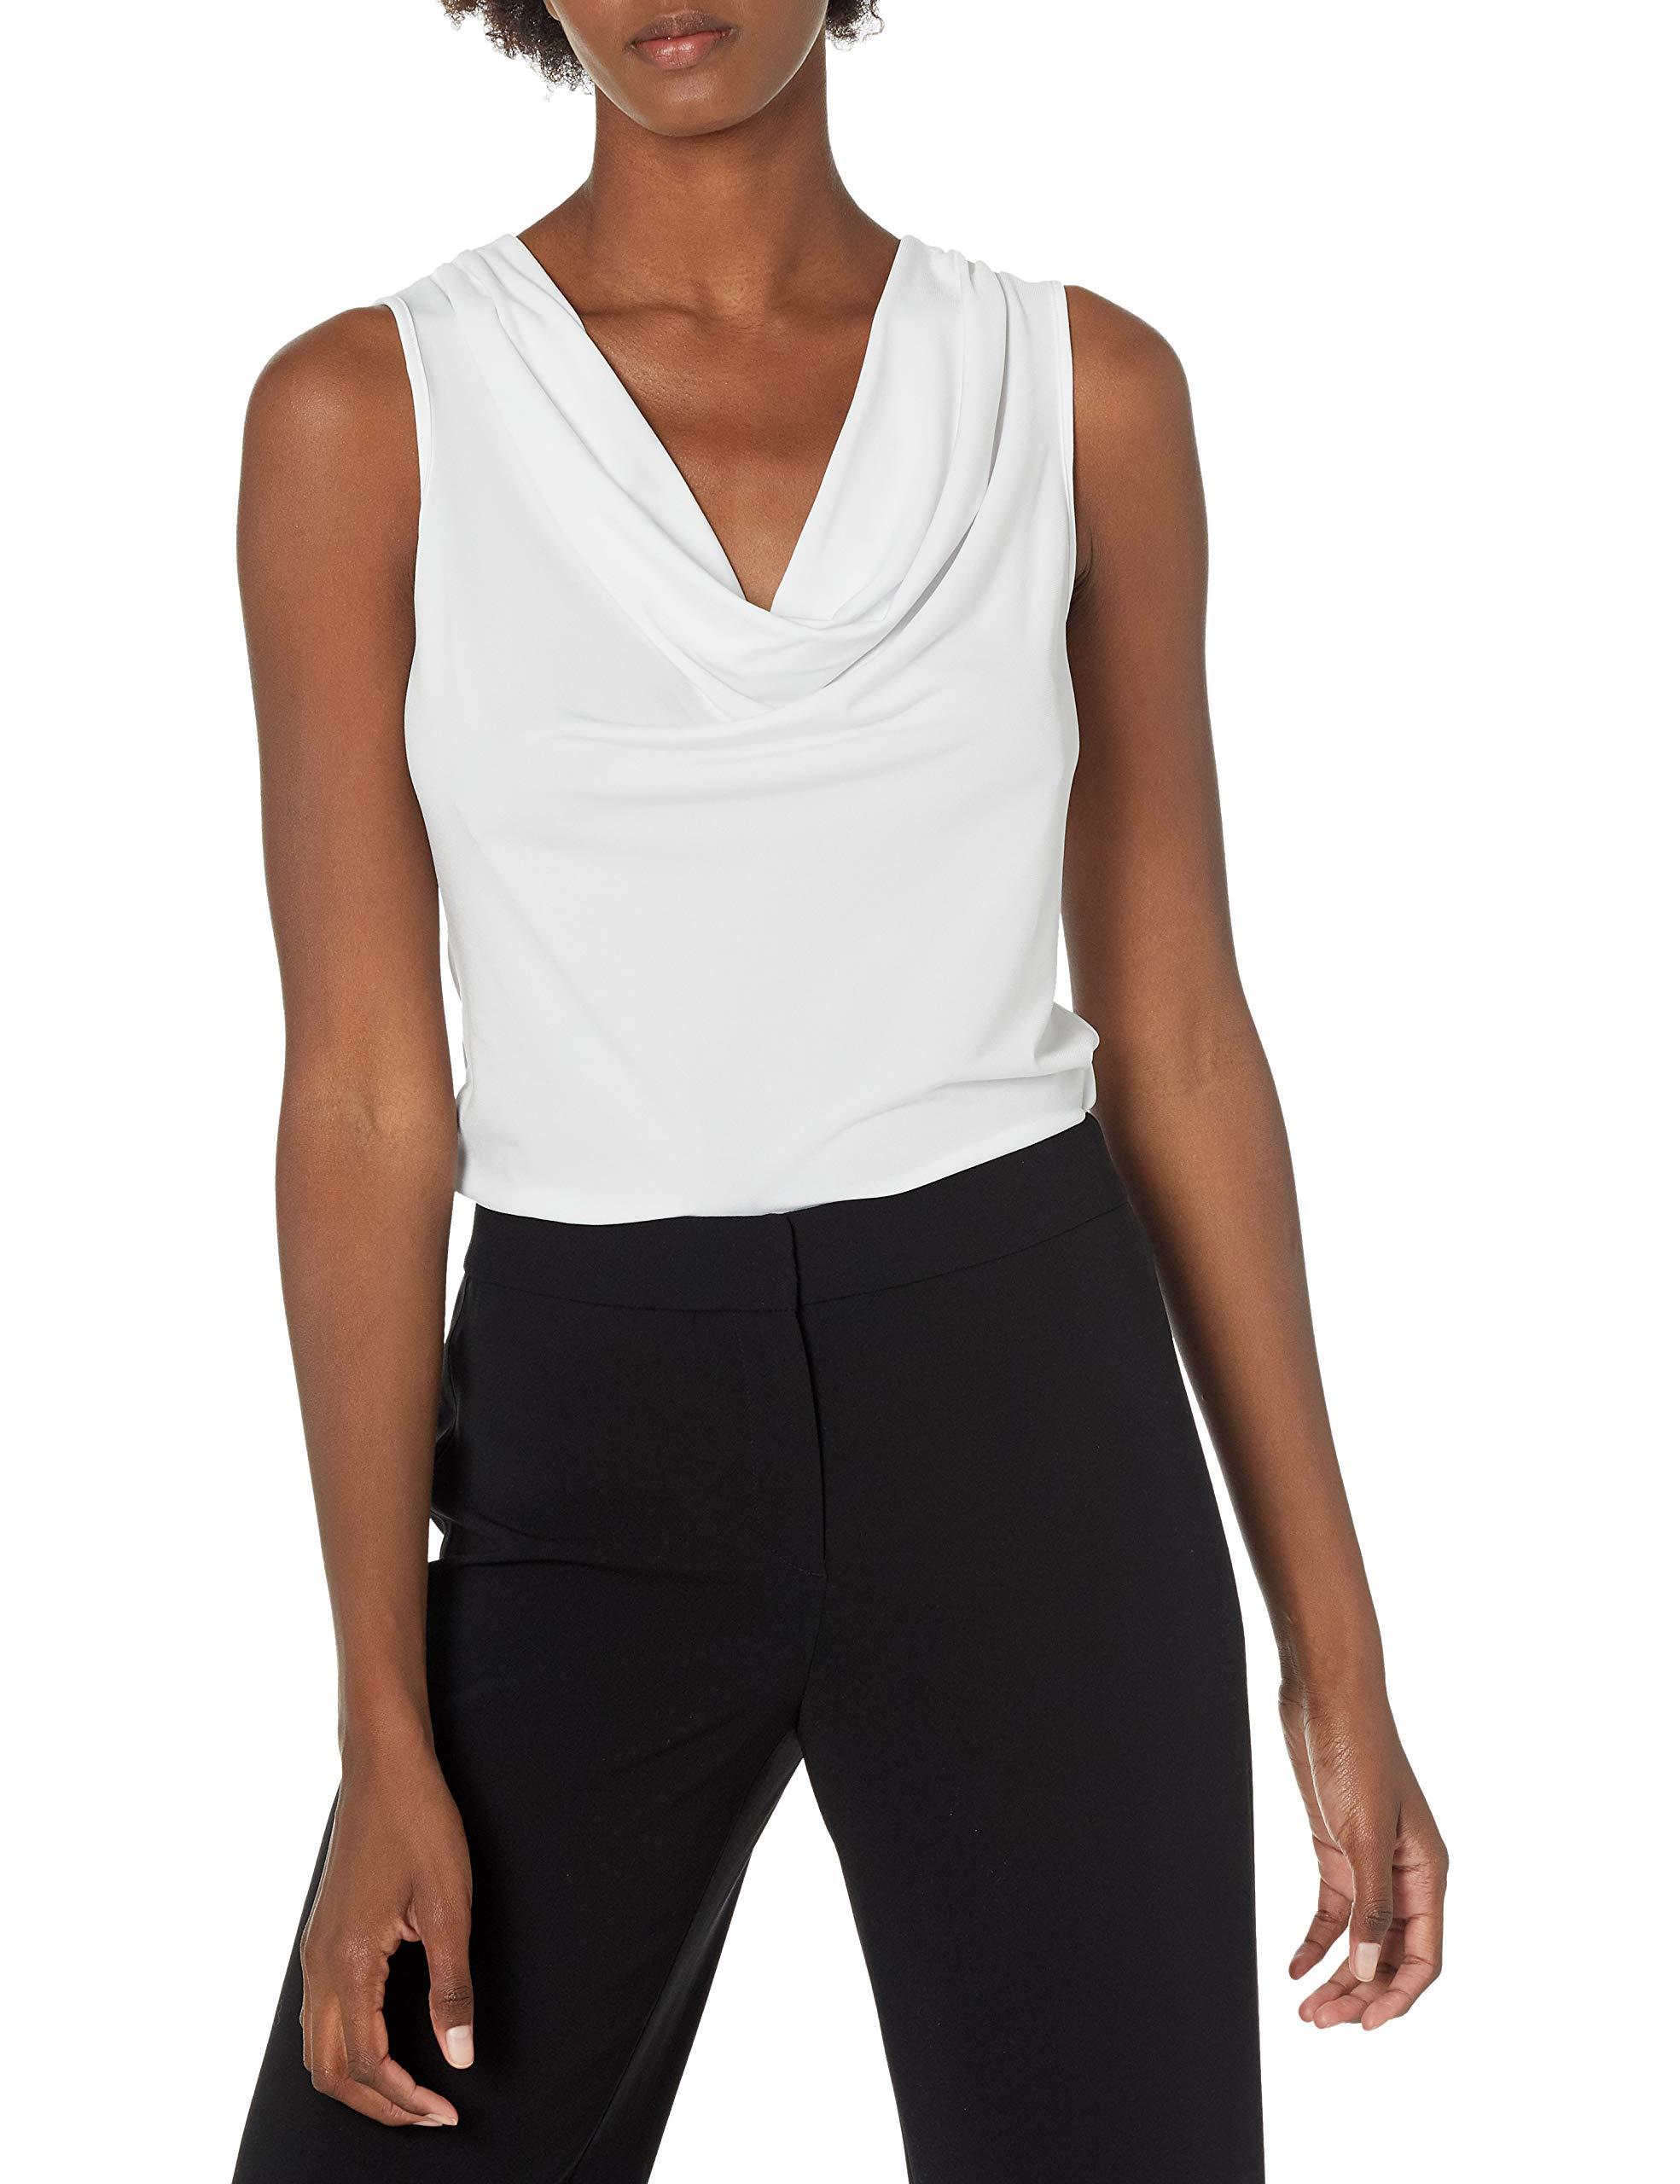 Calvin Klein Women's Cowl Neck Sleeveless Top (Regular and Plus Sizes)